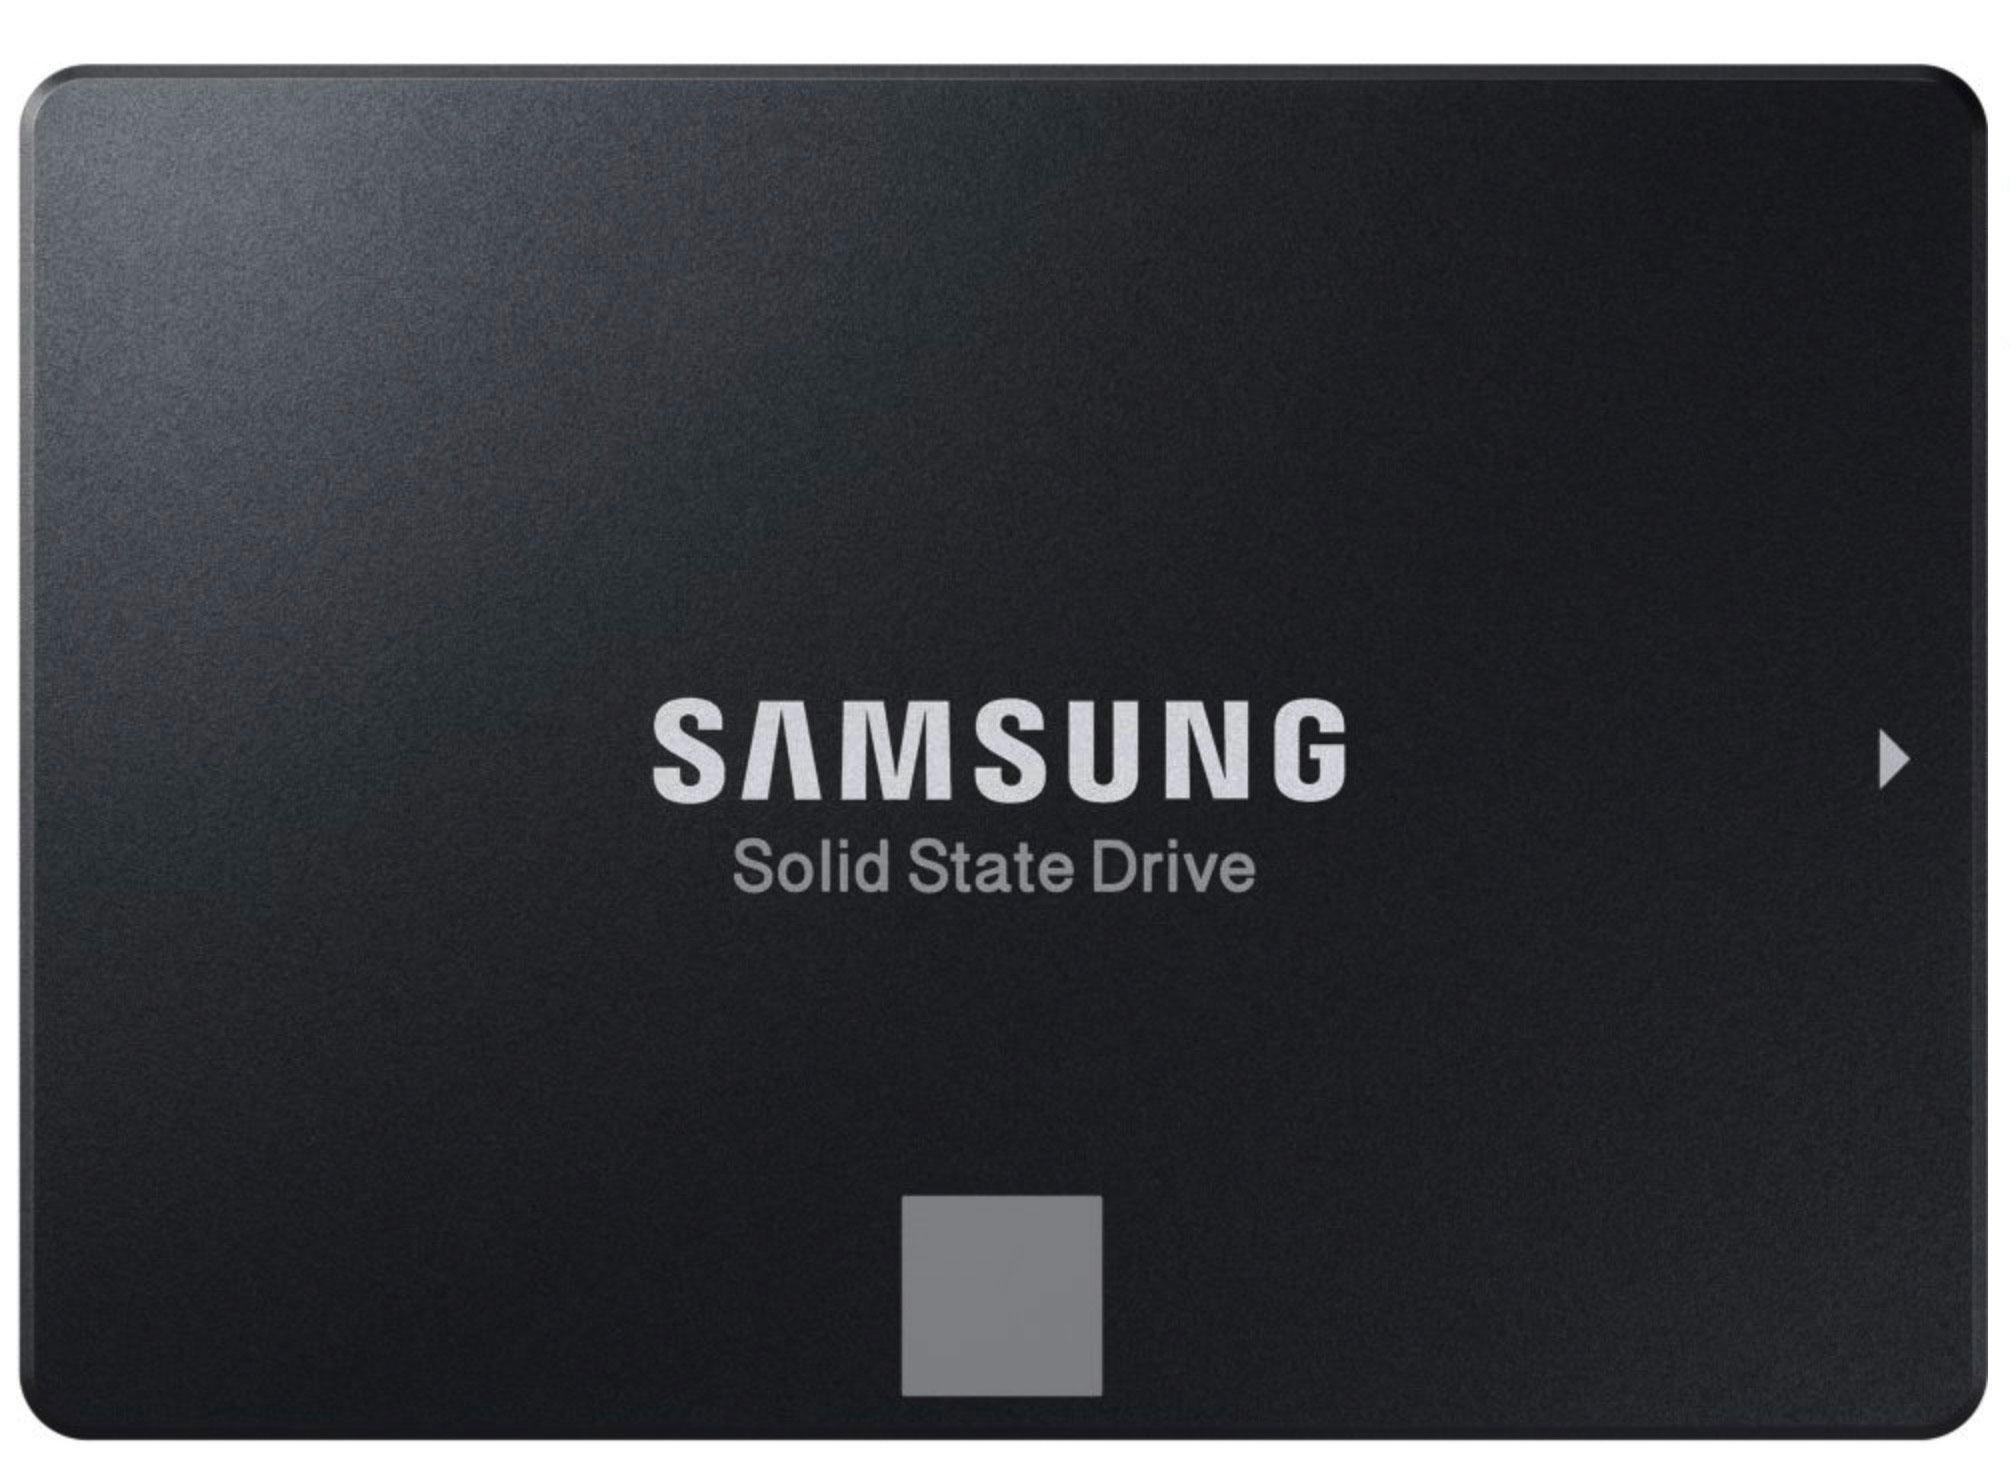 Le SSD Samsung 860 EVO 1 To est en promotion